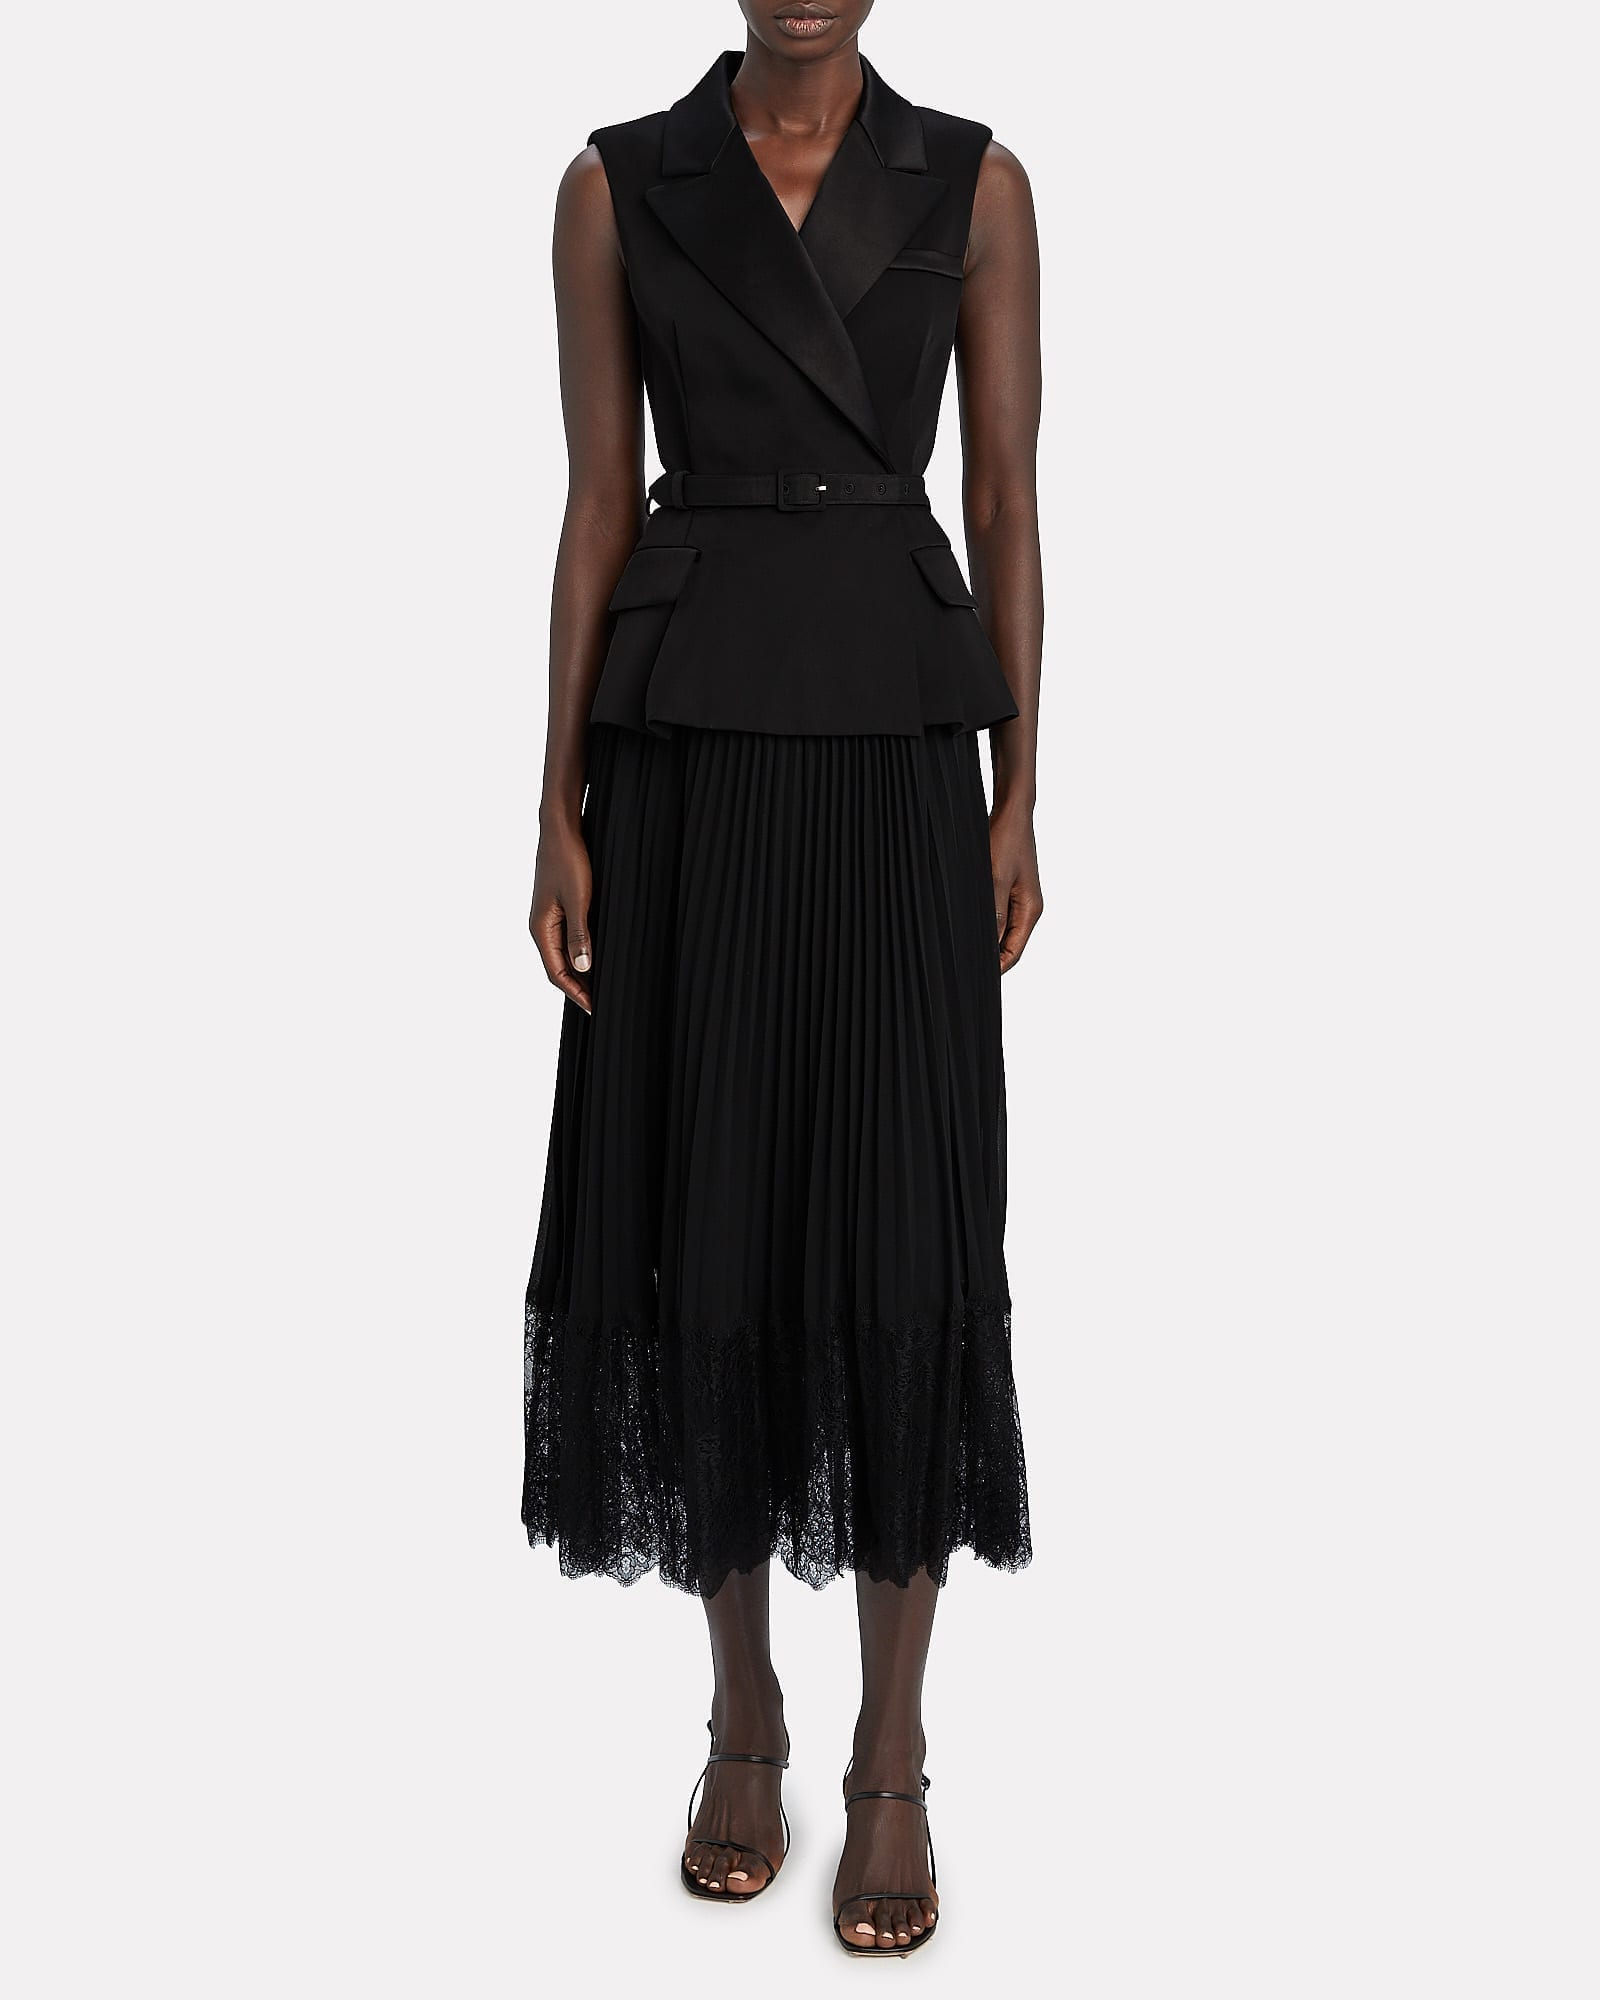 SELF-PORTRAIT Layered Crepe Midi Dress